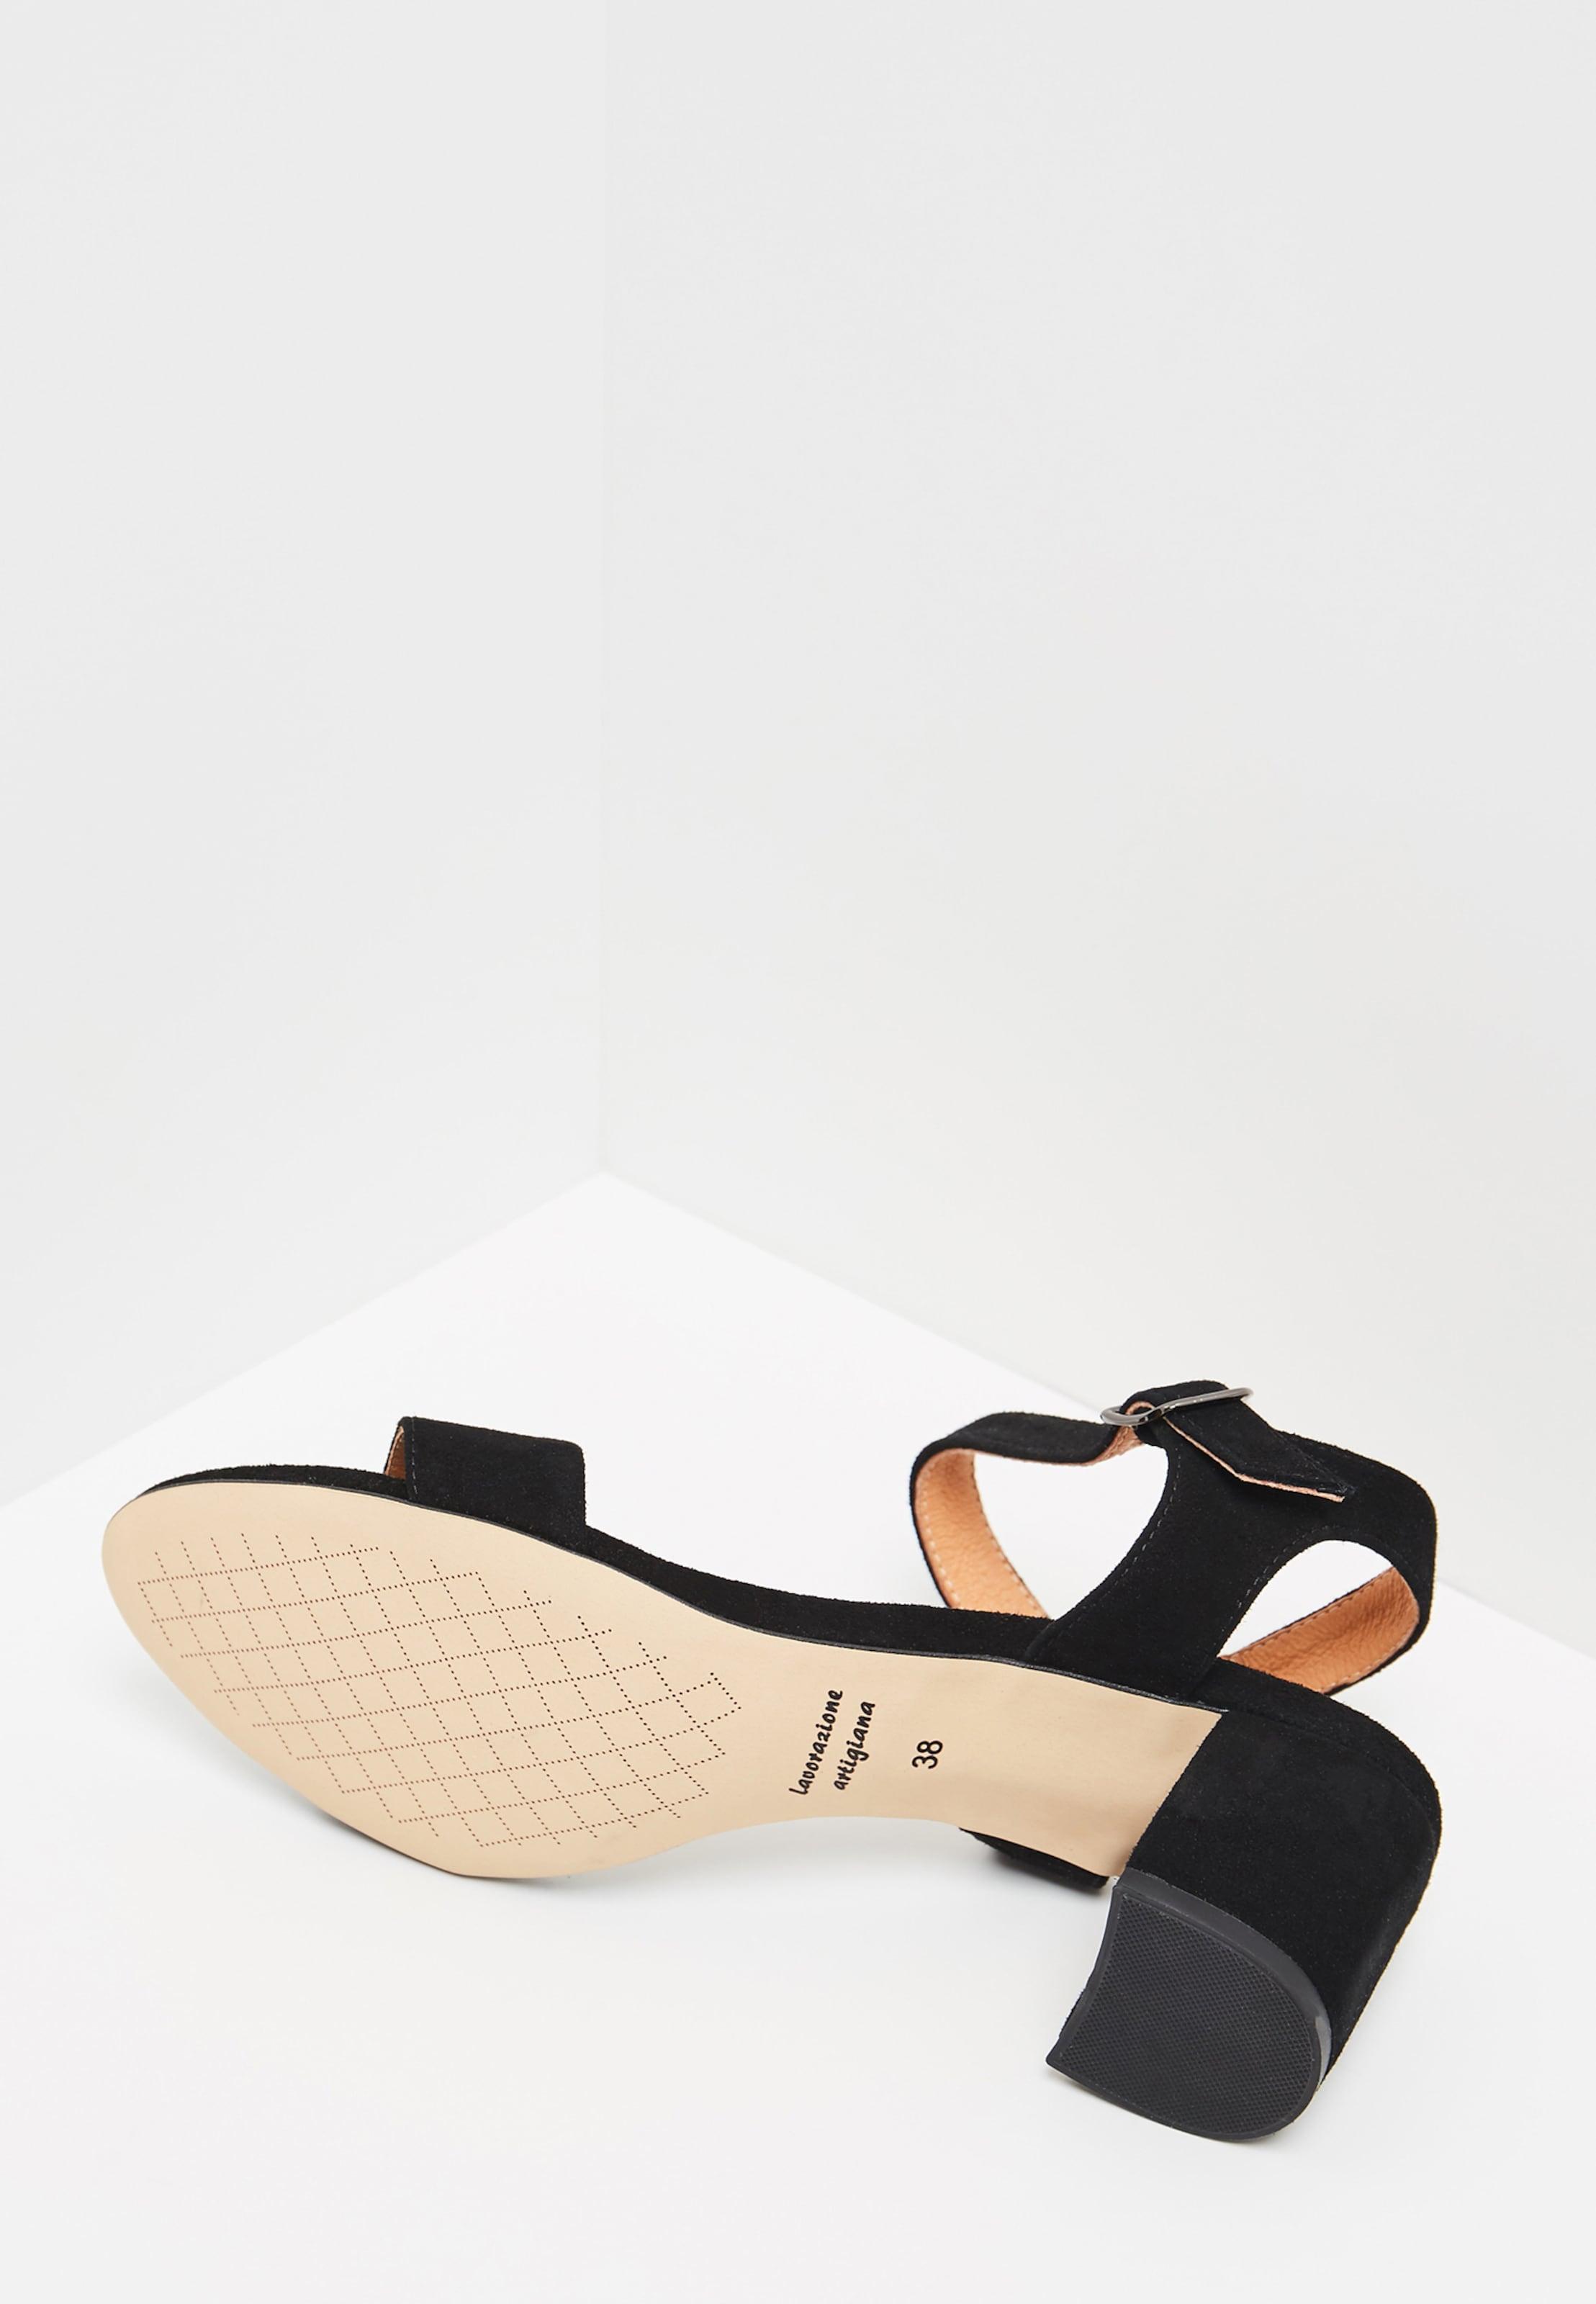 Usha Sandalette In Usha Schwarz In Schwarz Sandalette Usha Sandalette In PkXZOiu